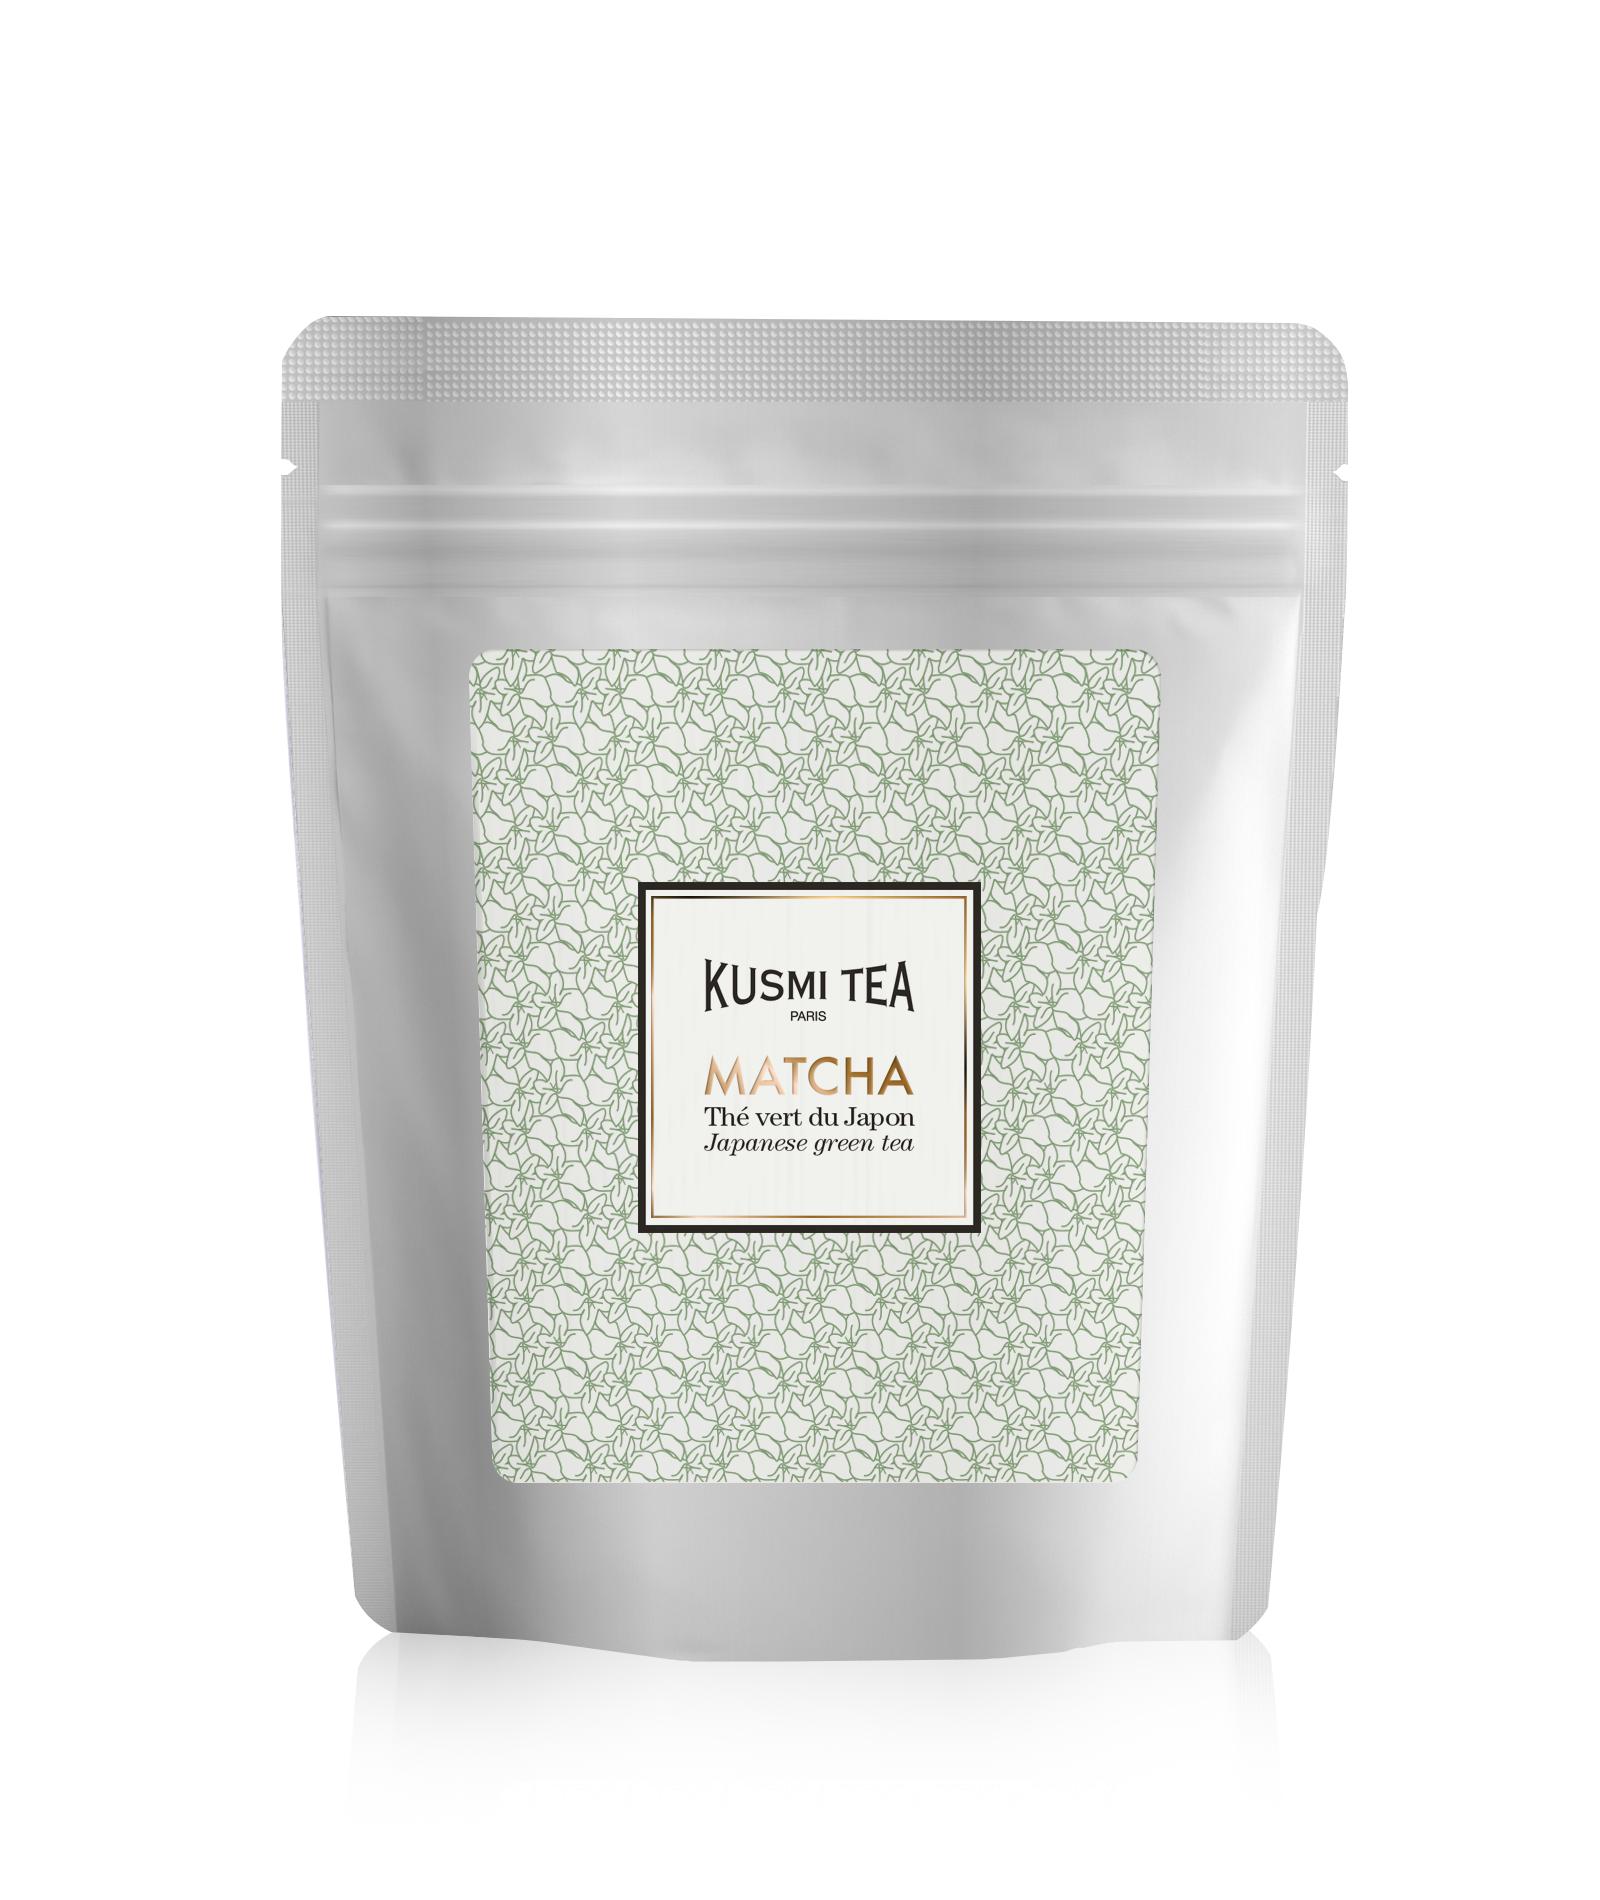 KUSMI TEA Matcha Thé vert  Kusmi Tea